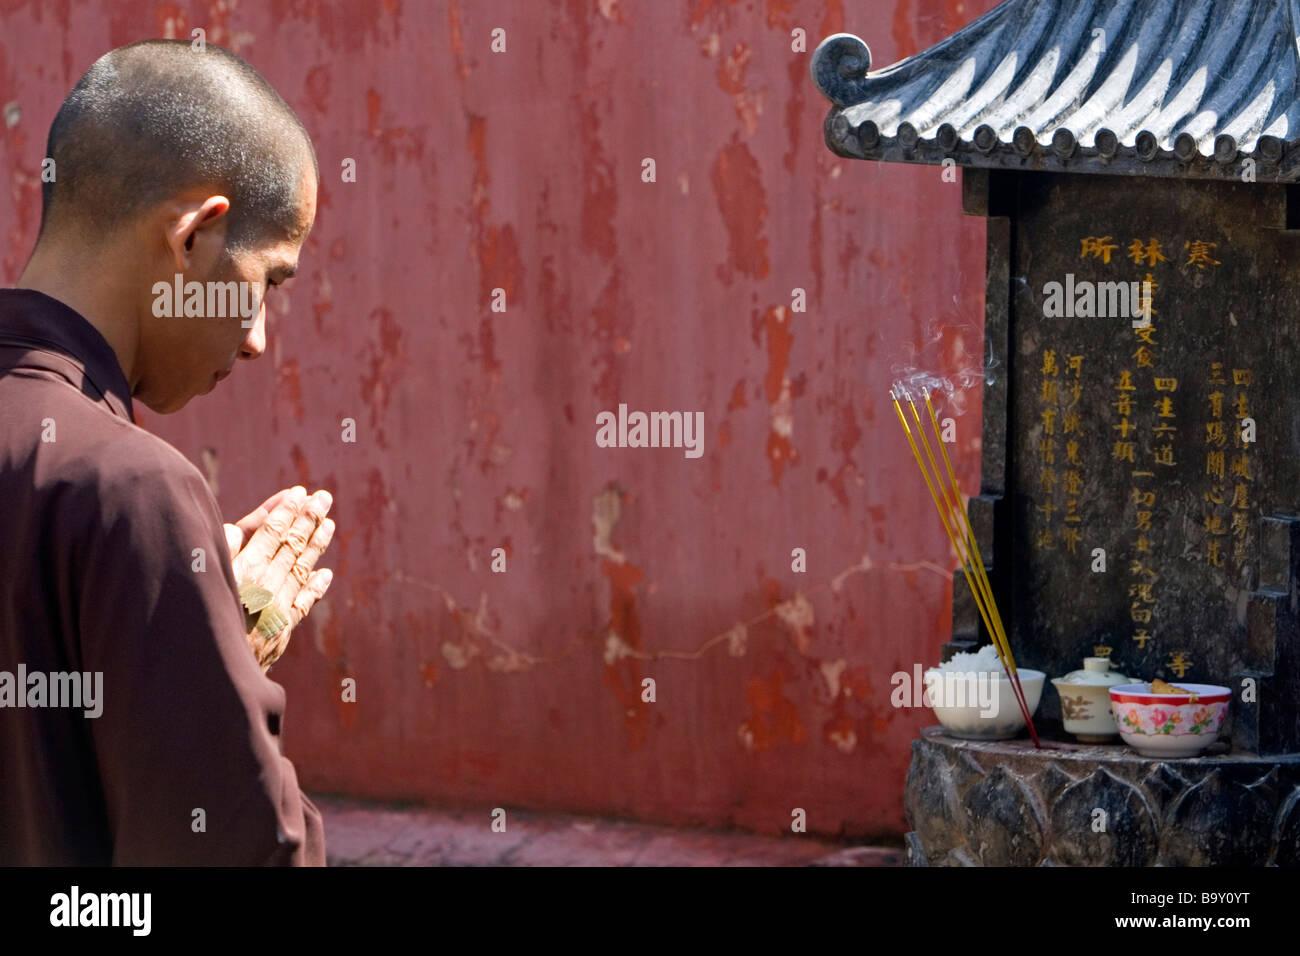 Prayer at the Jade Emperor Pagoda Buddhist temple in Ho Chi Minh City Vietnam Stock Photo